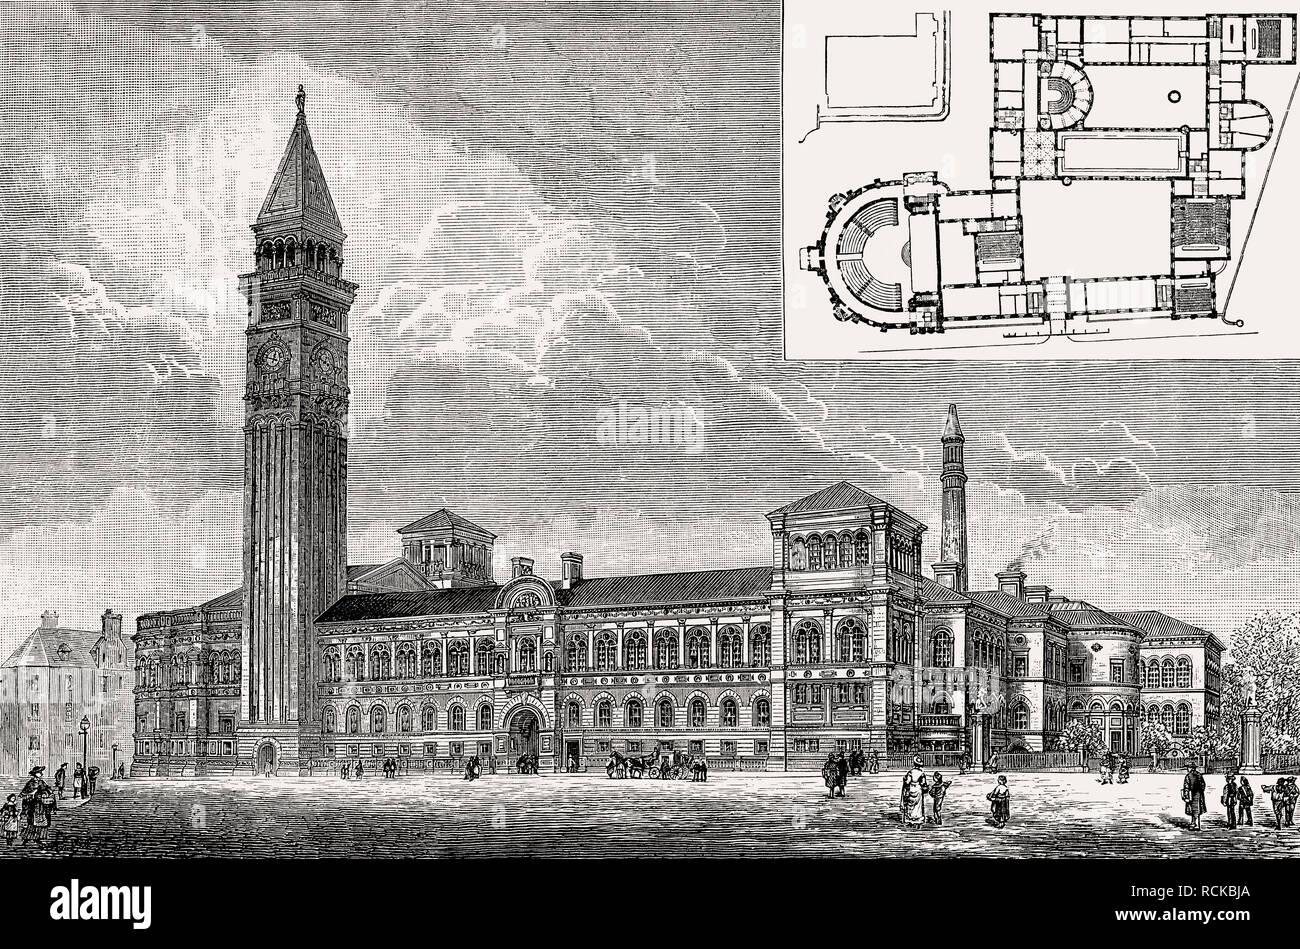 Model of  the Edinburgh Medical School, Scotland, 19th century - Stock Image